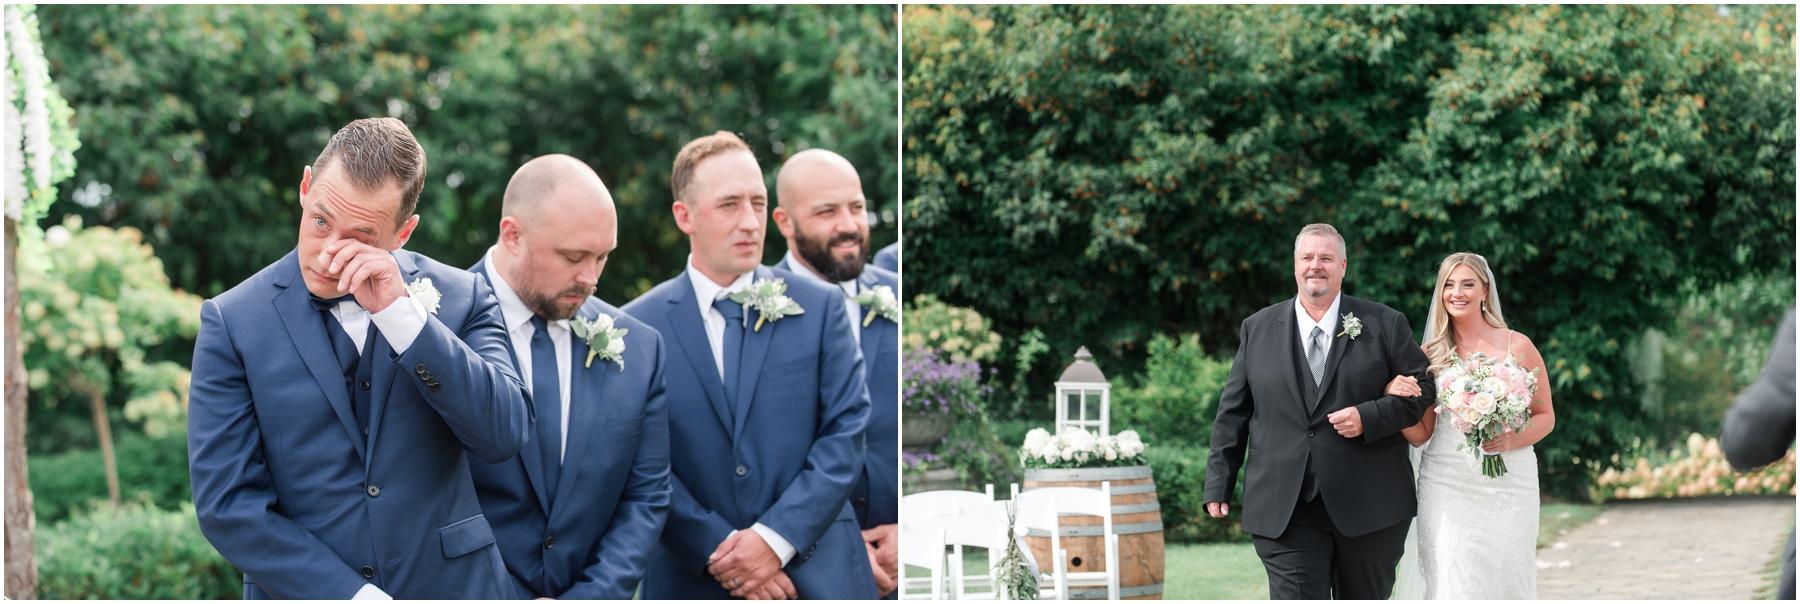 Bloom Field Gardens Wedding Precious Photography Katherine & Chris_043